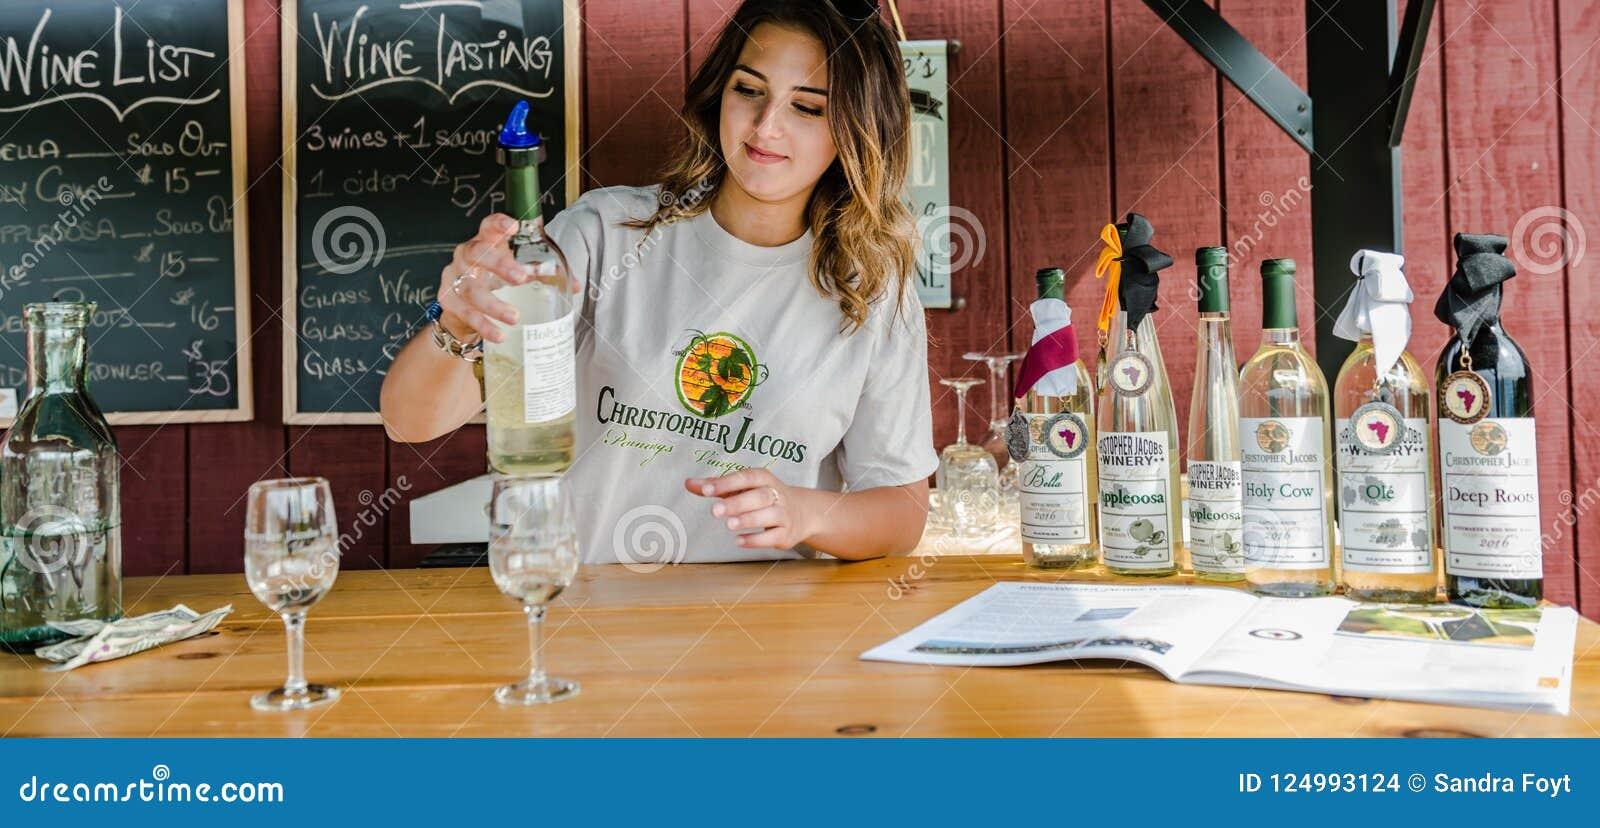 Hudson Valley Wine Tasting Station